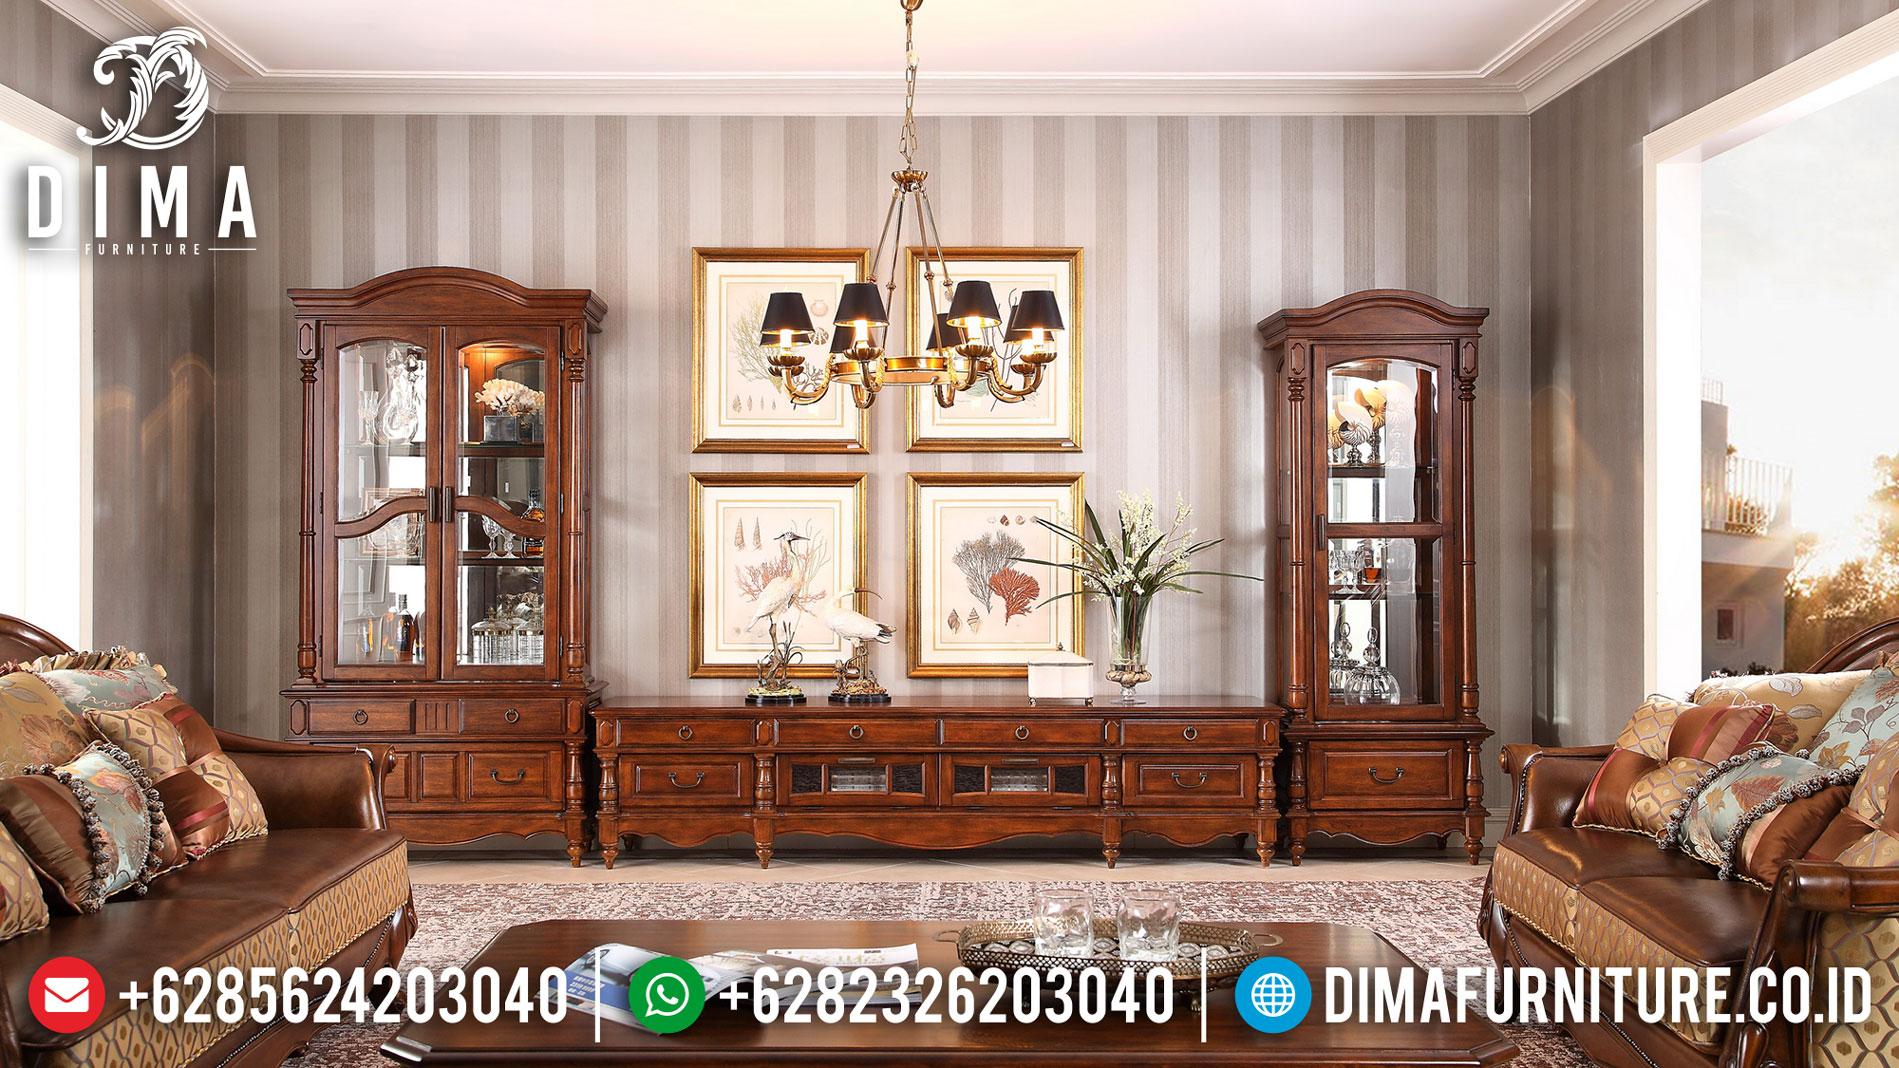 New Bufet TV Ukiran Luxury Design Living Room Classic Elegant Furniture Jepara BT-0879